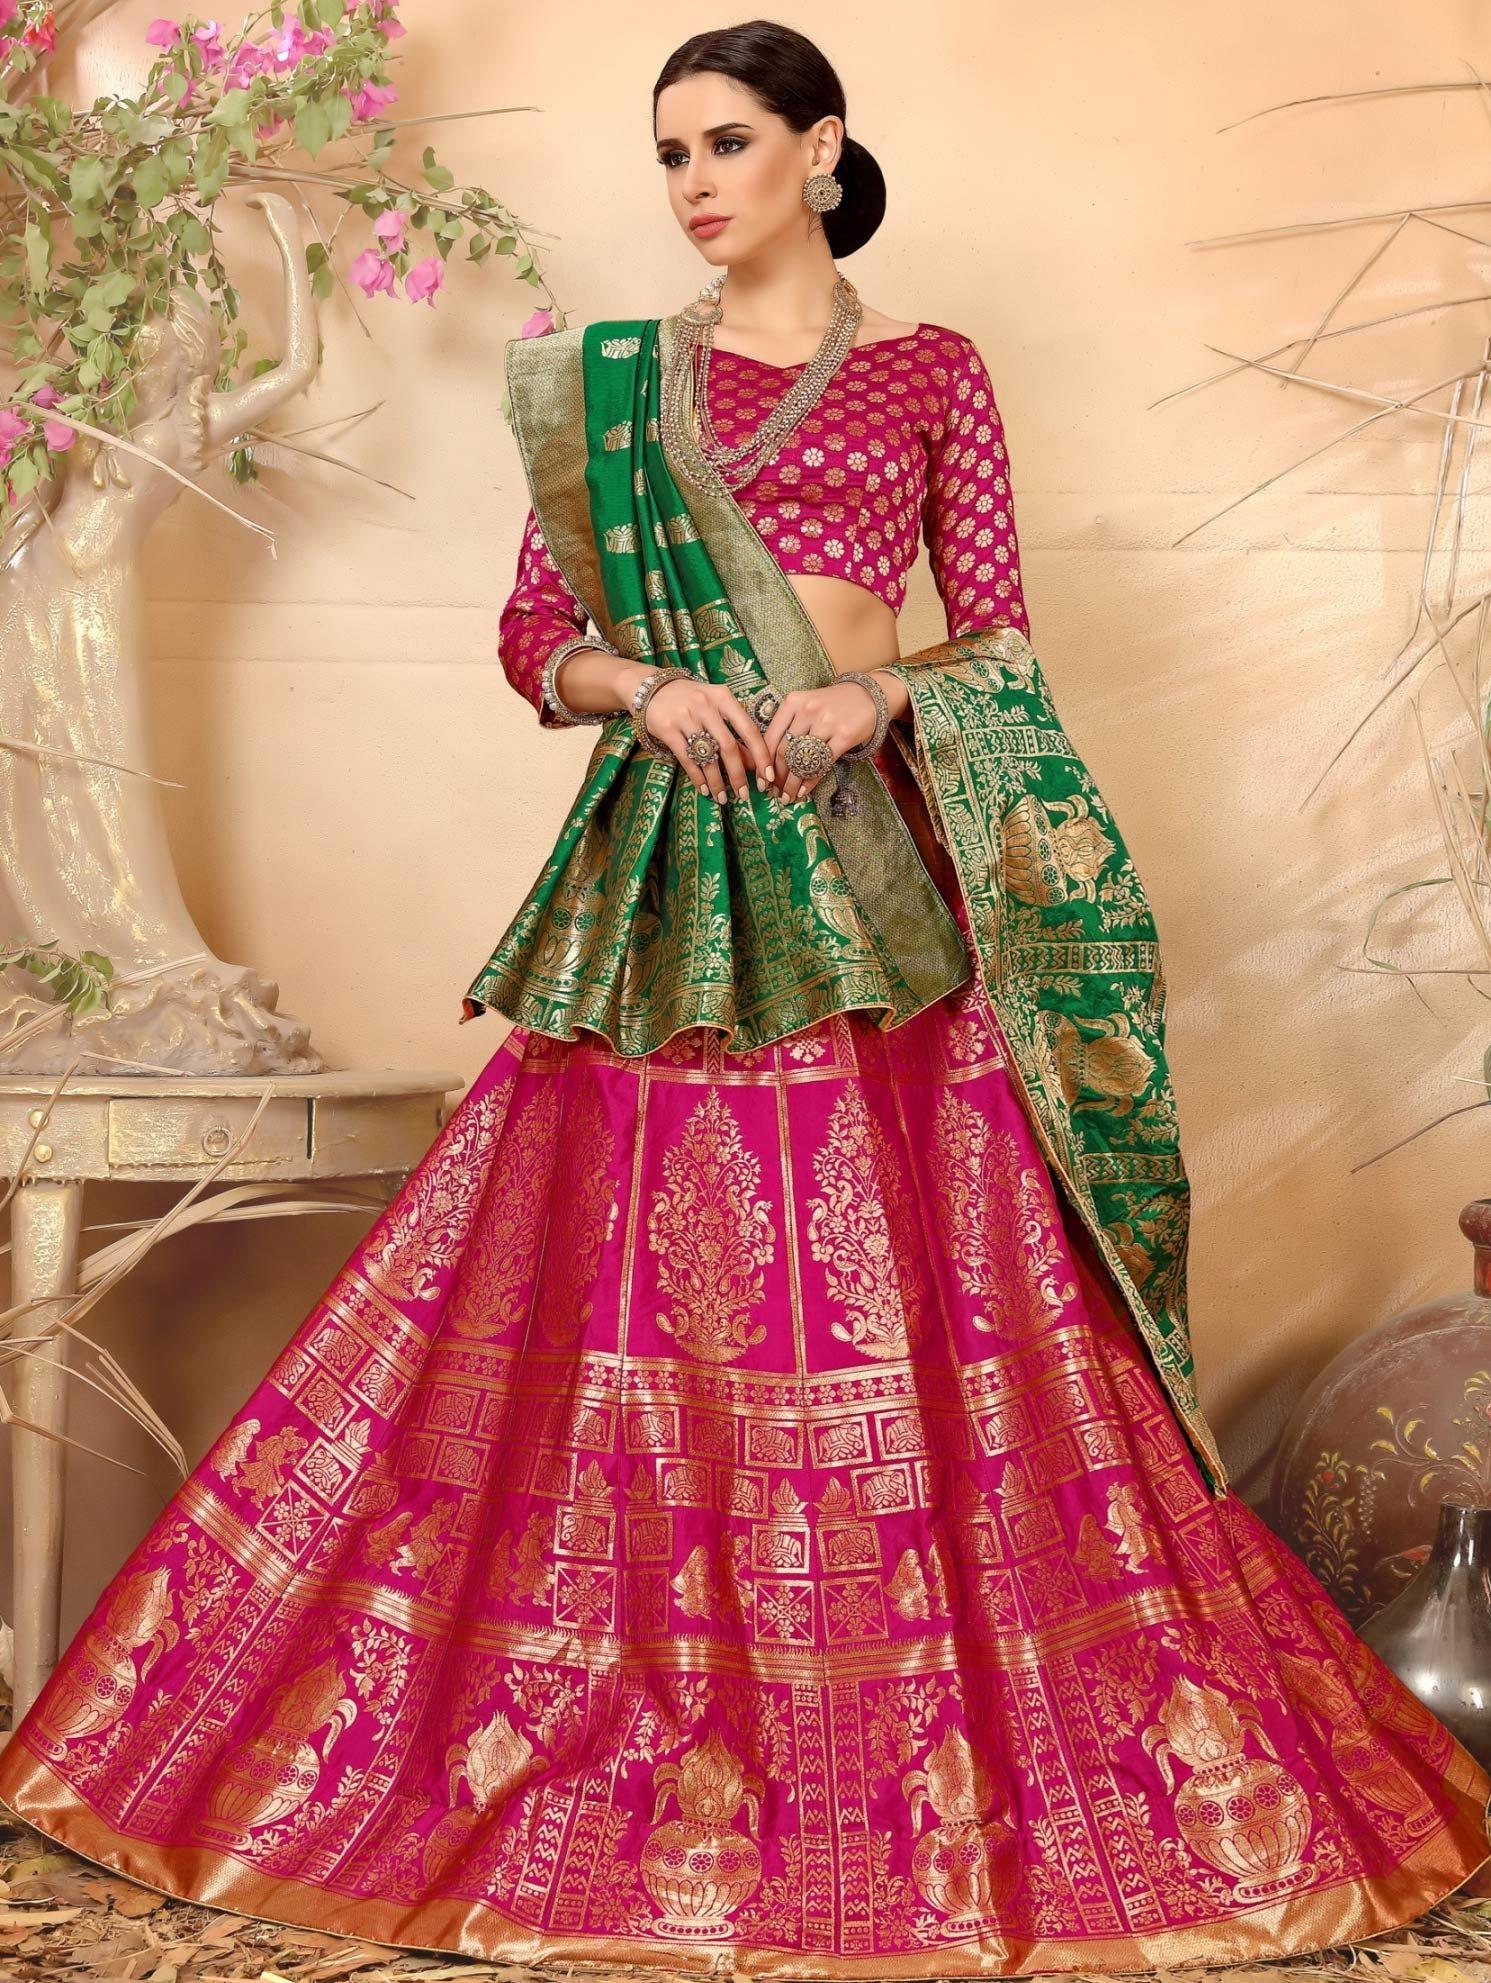 28478c8ae8 Buy Rani Pink Banarasi Silk Jacquard Lehenga Choli With Zari Weaving -  CCAI2292